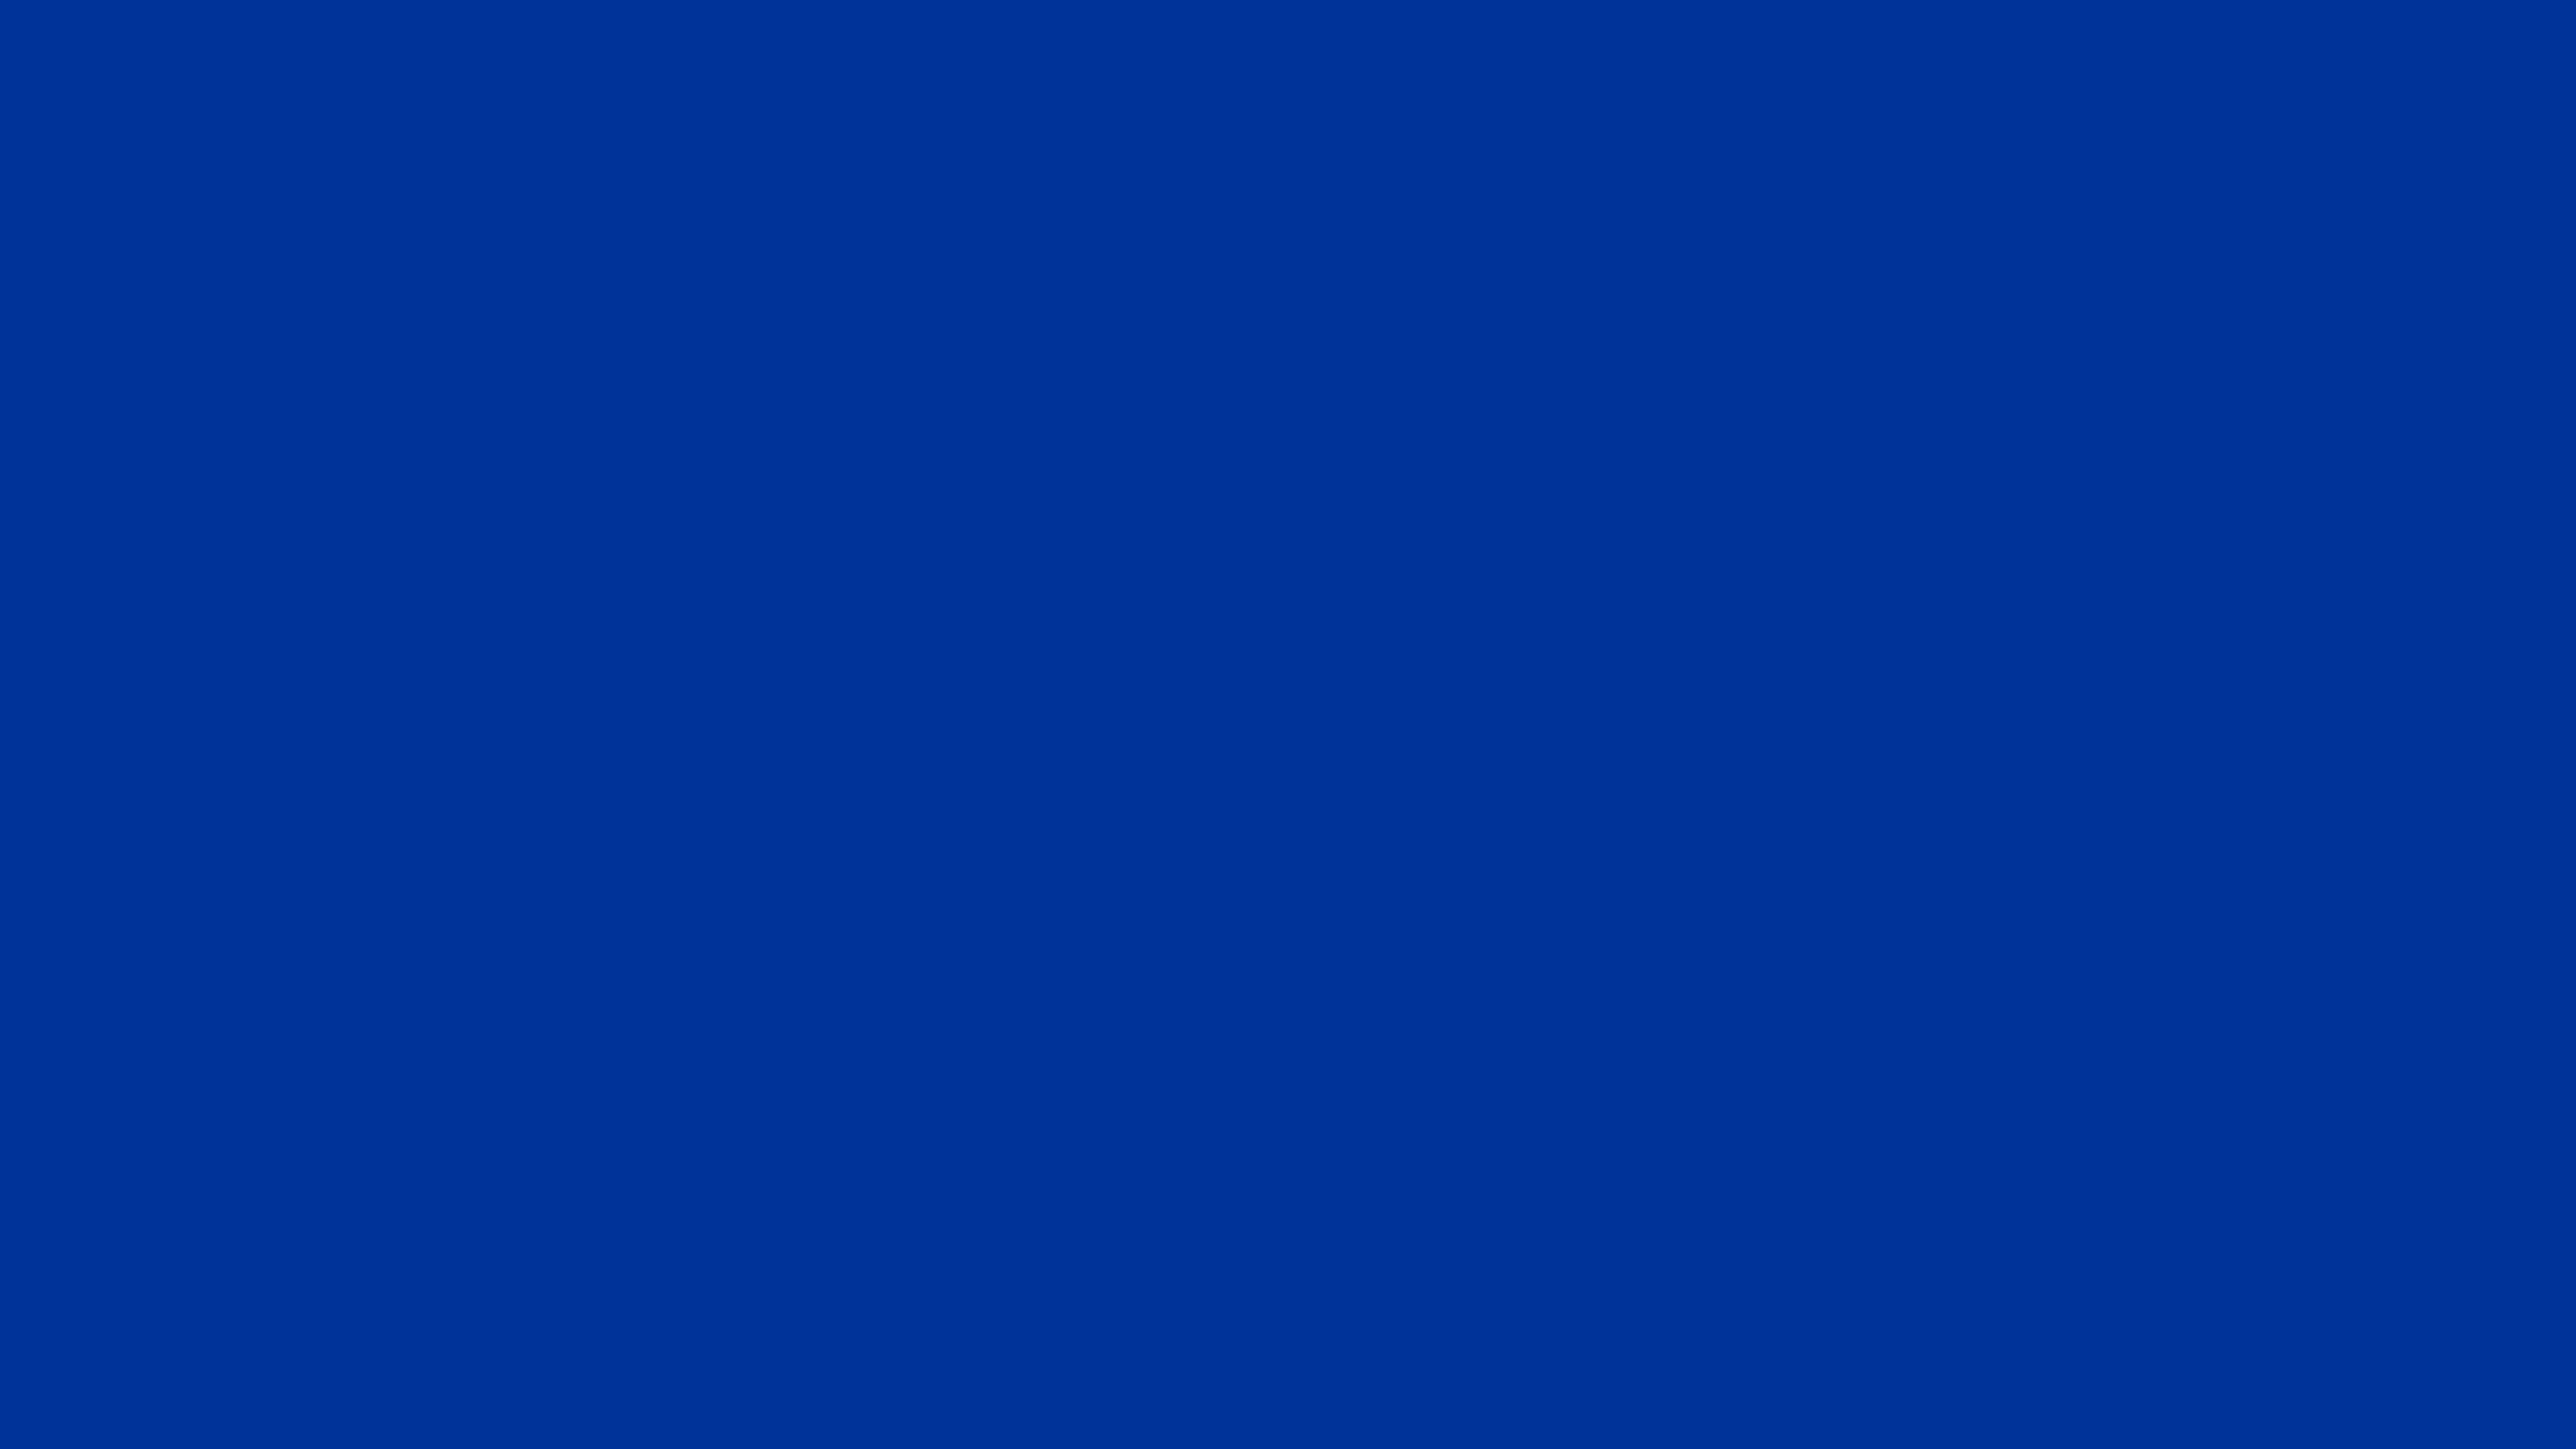 5120x2880 Smalt Dark Powder Blue Solid Color Background